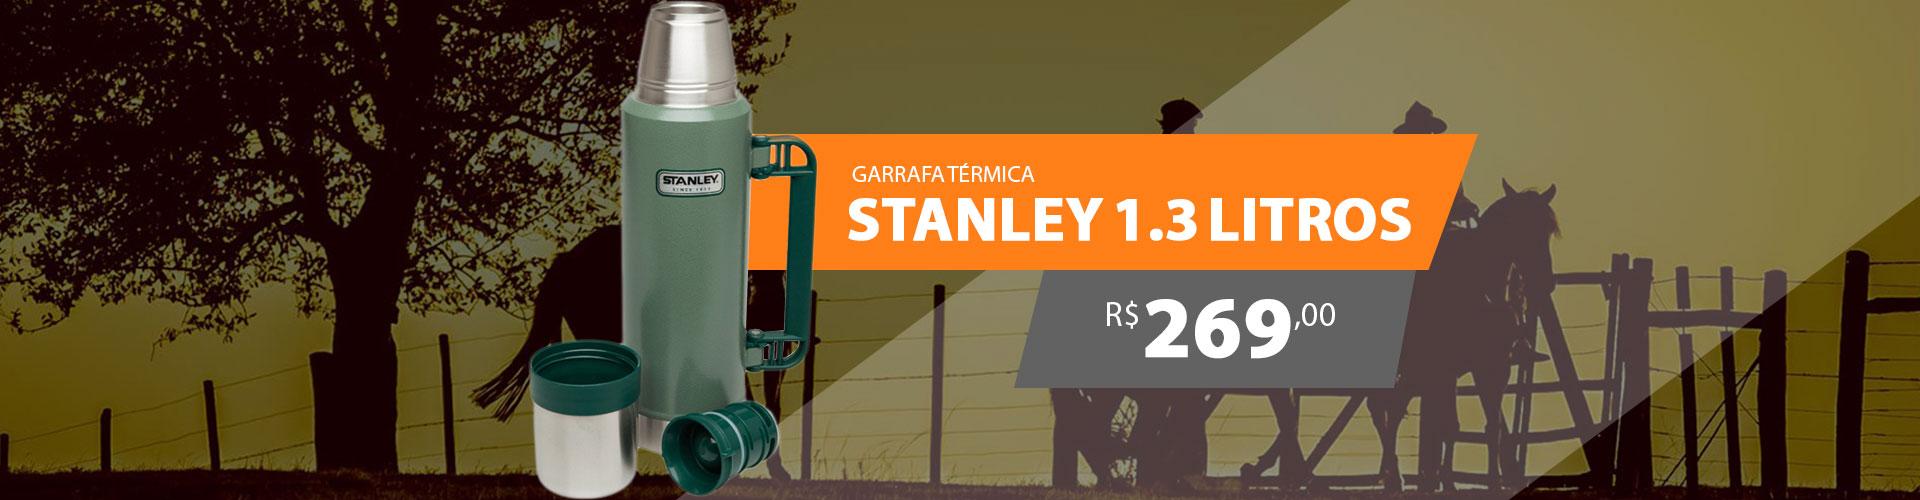 Stanley 1.3 Litros